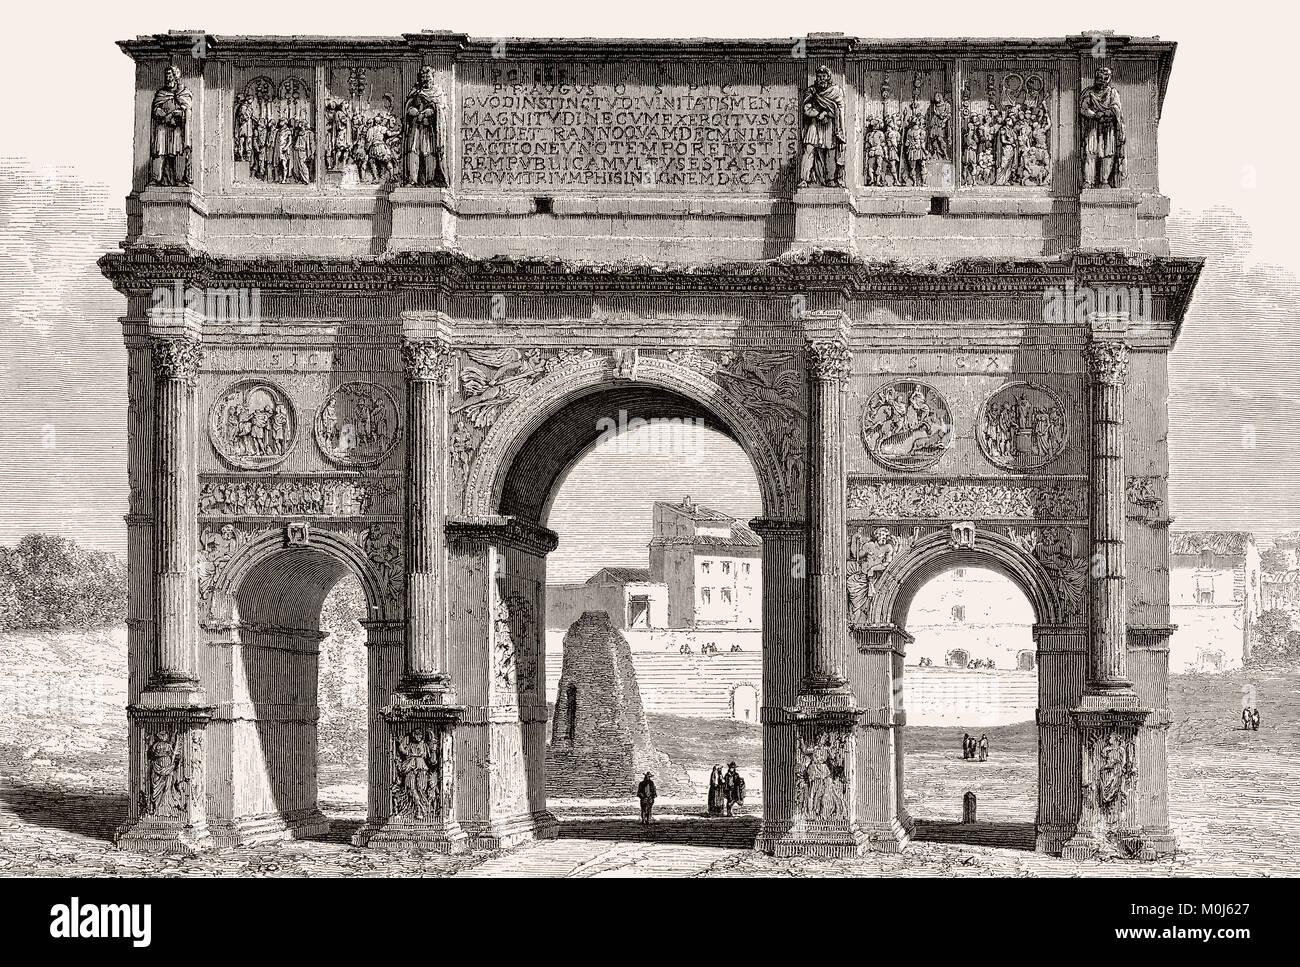 The Arch of Constantine, Via triumphalis, Rome, Italy, 19th Century - Stock Image